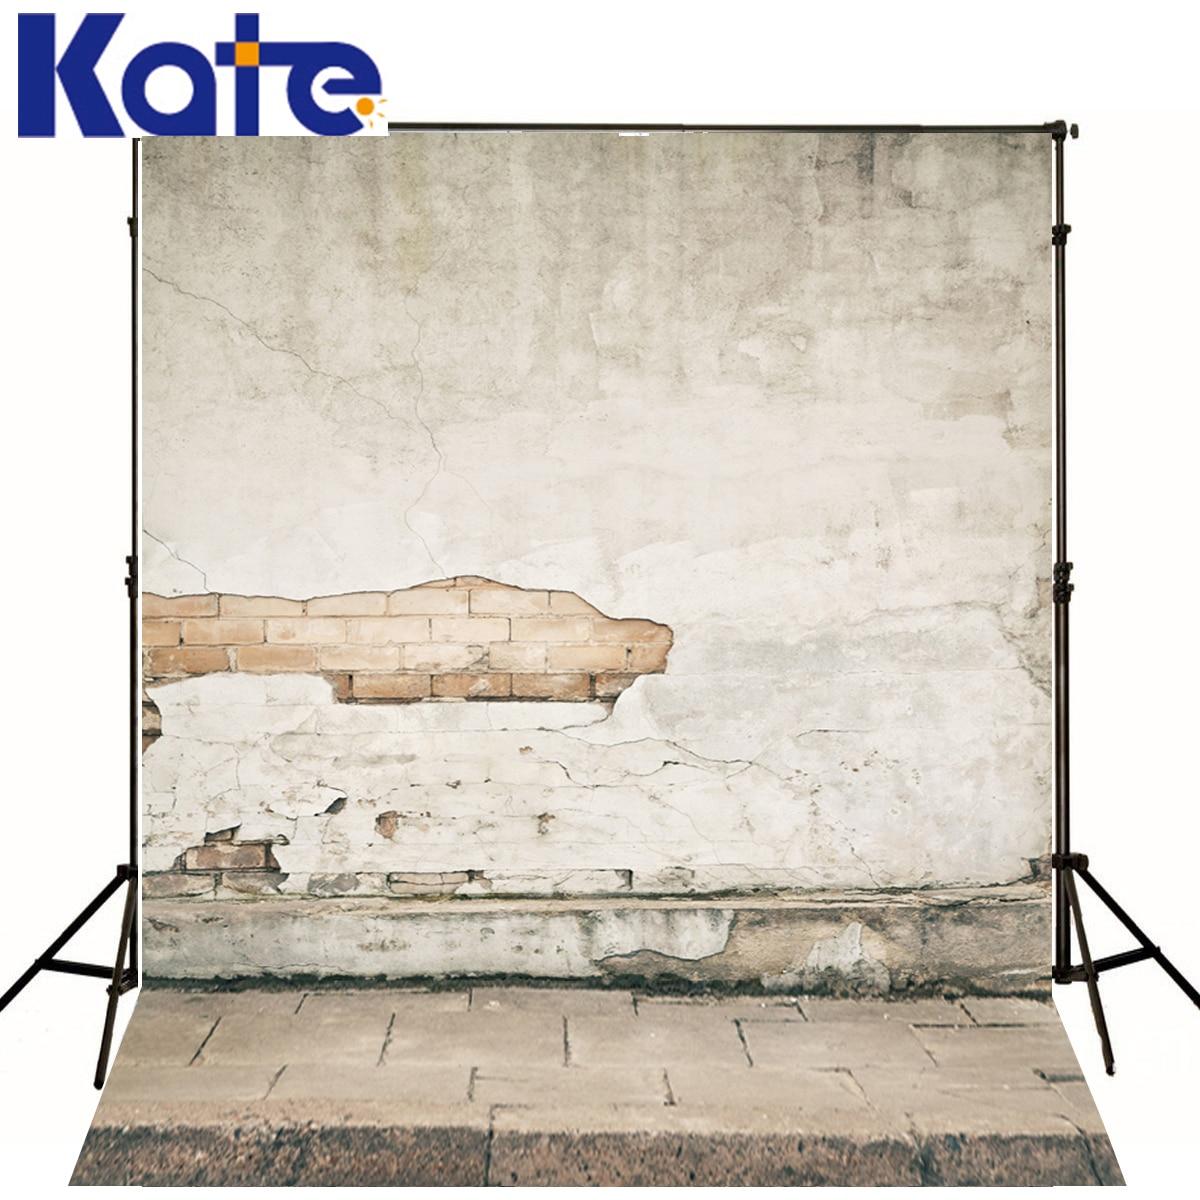 Kate Newborn Baby Backdrops Photography Broke Crack Brick Wall Fond Studio Photo  Stone Step Floor Studio Backdrop<br>